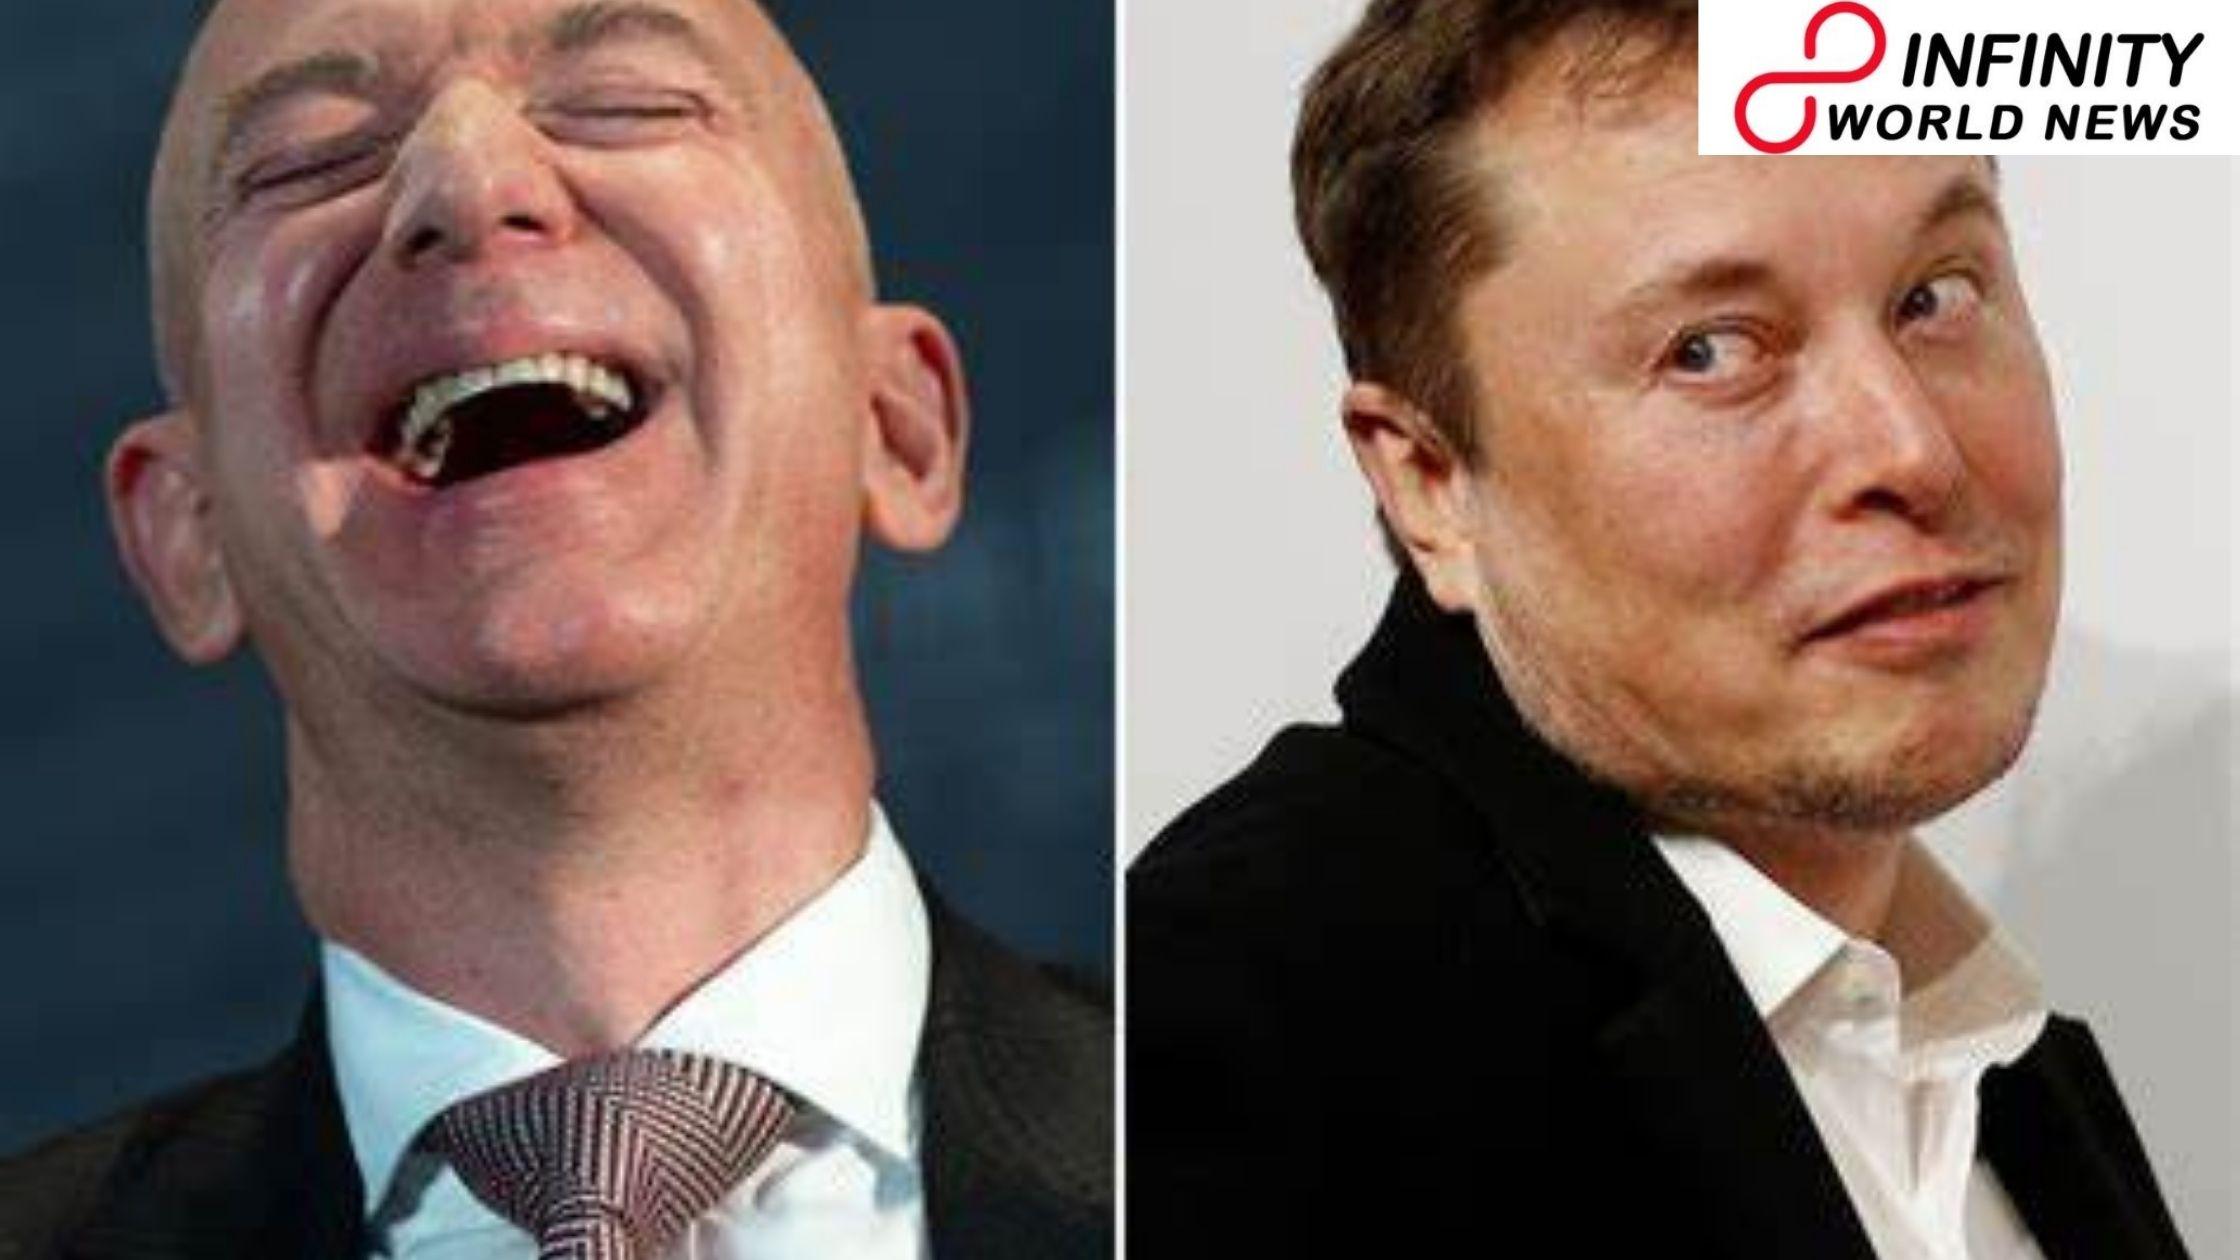 Amazon to Star Trek: Jeff Bezos is Fixed to Focus on 'Blue Origin'. Is Elon Musk Monitoring?